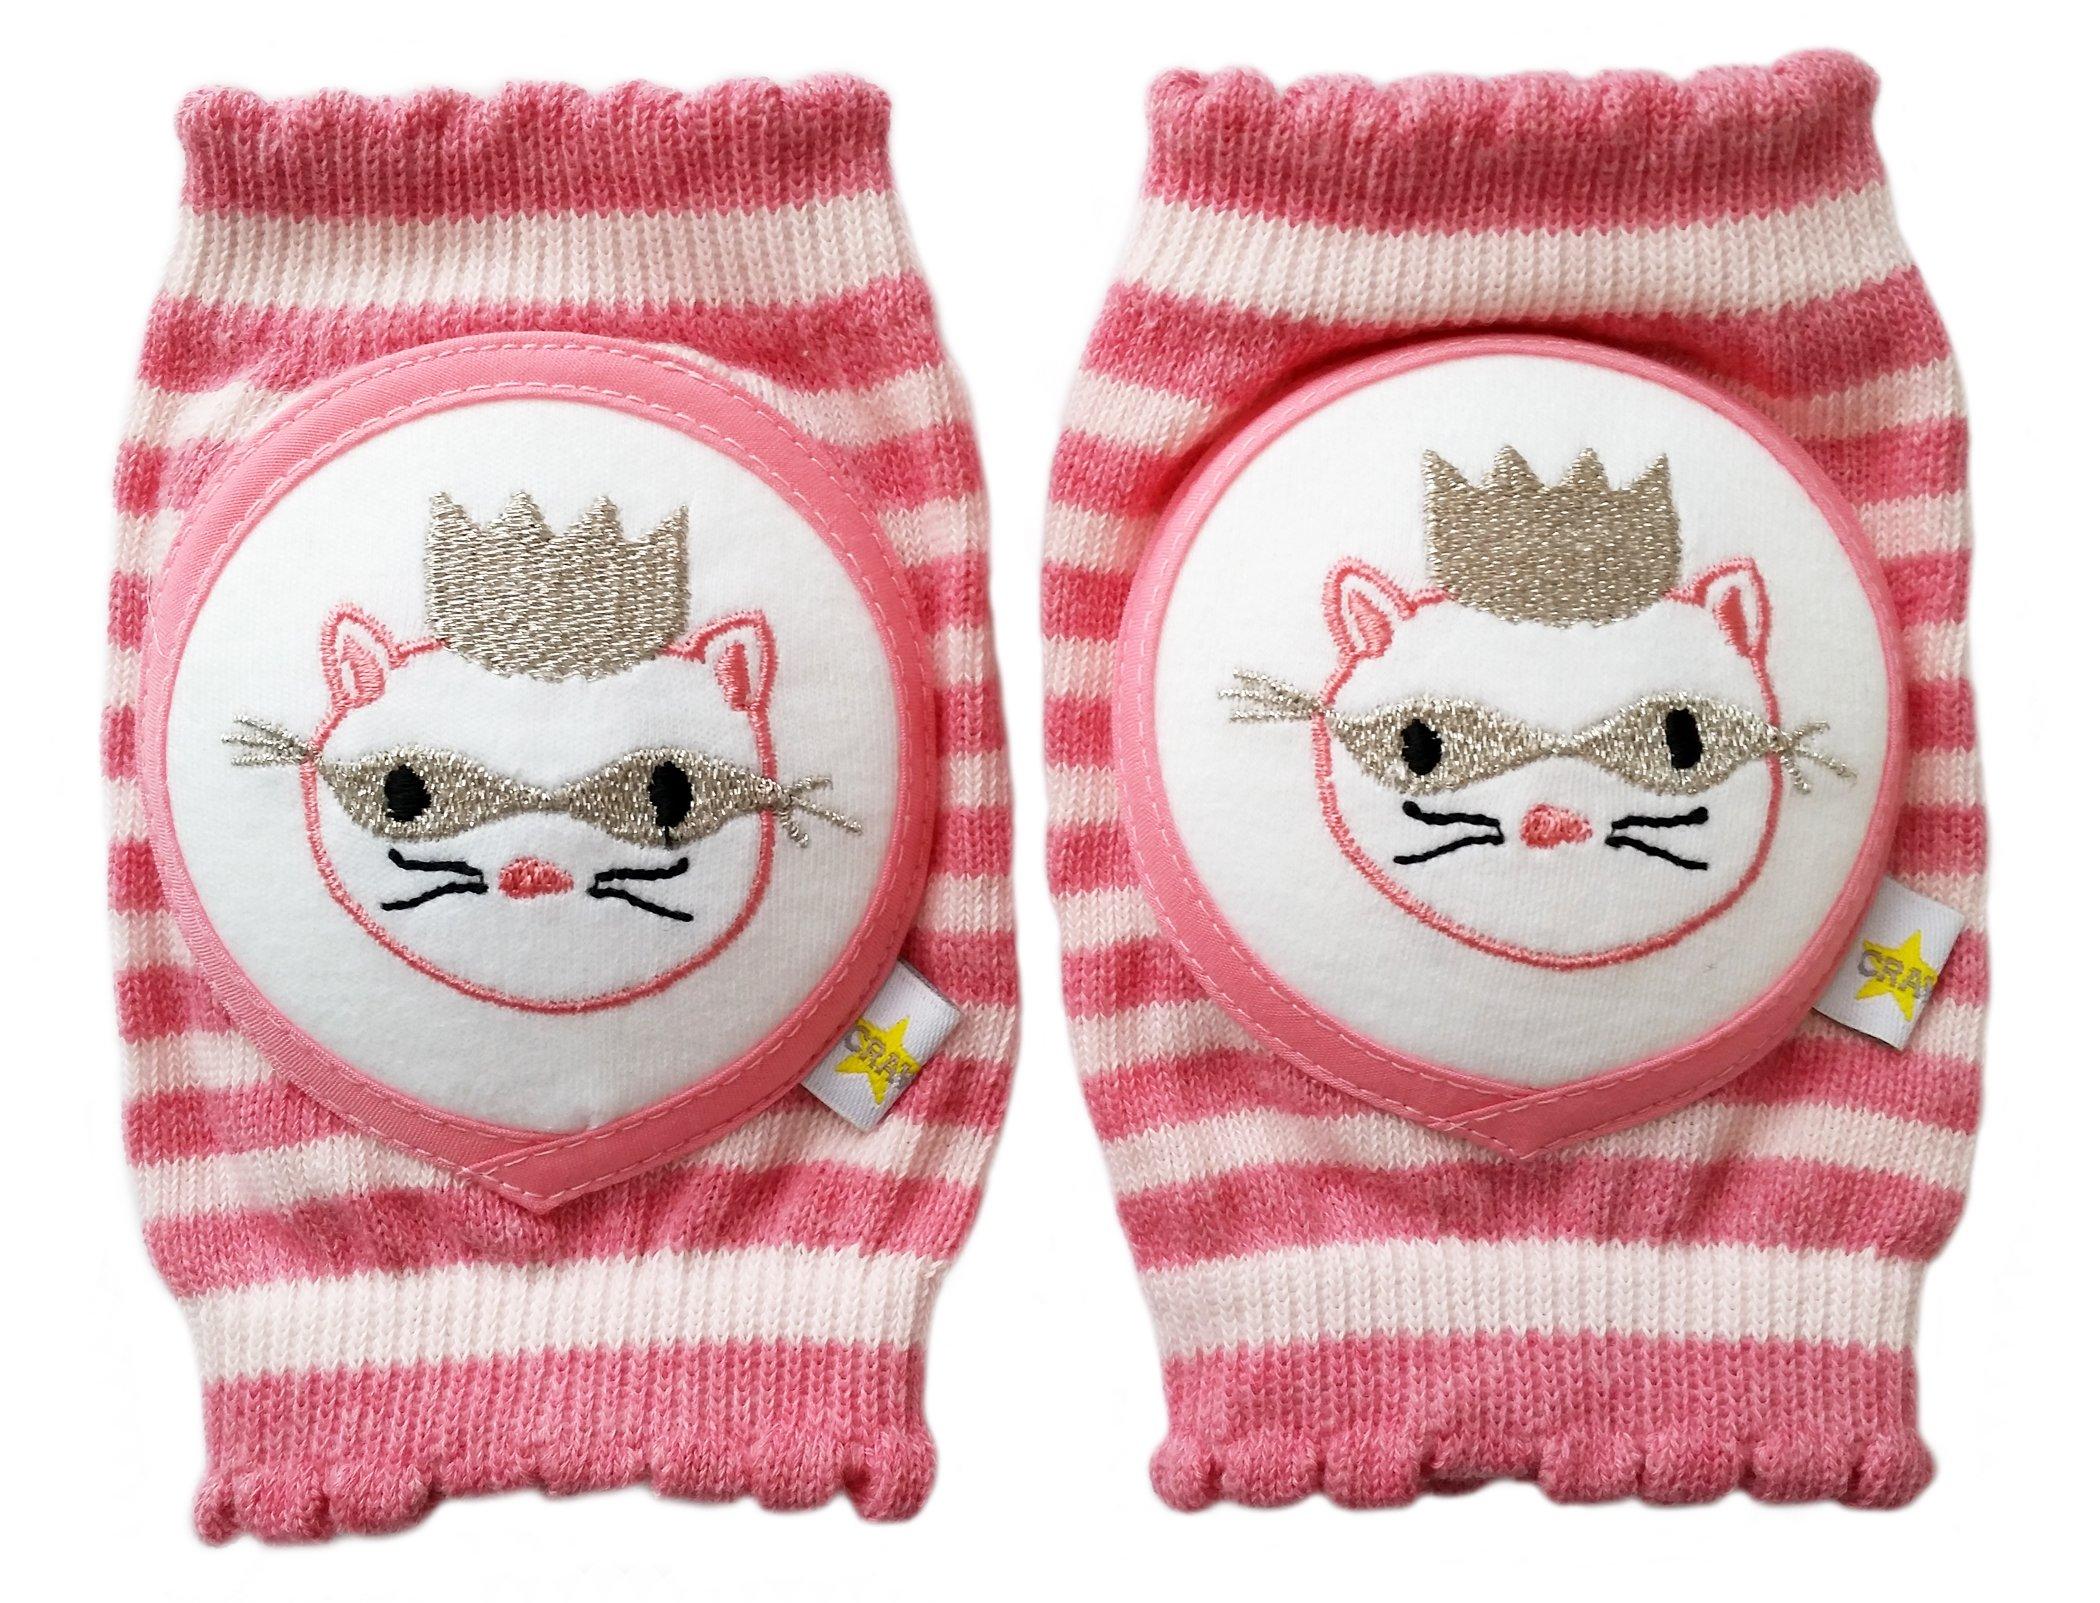 Crawlings Masked Princess Cat Kneepads One Size Peony (One Size, Peony Pink) by Crawlings